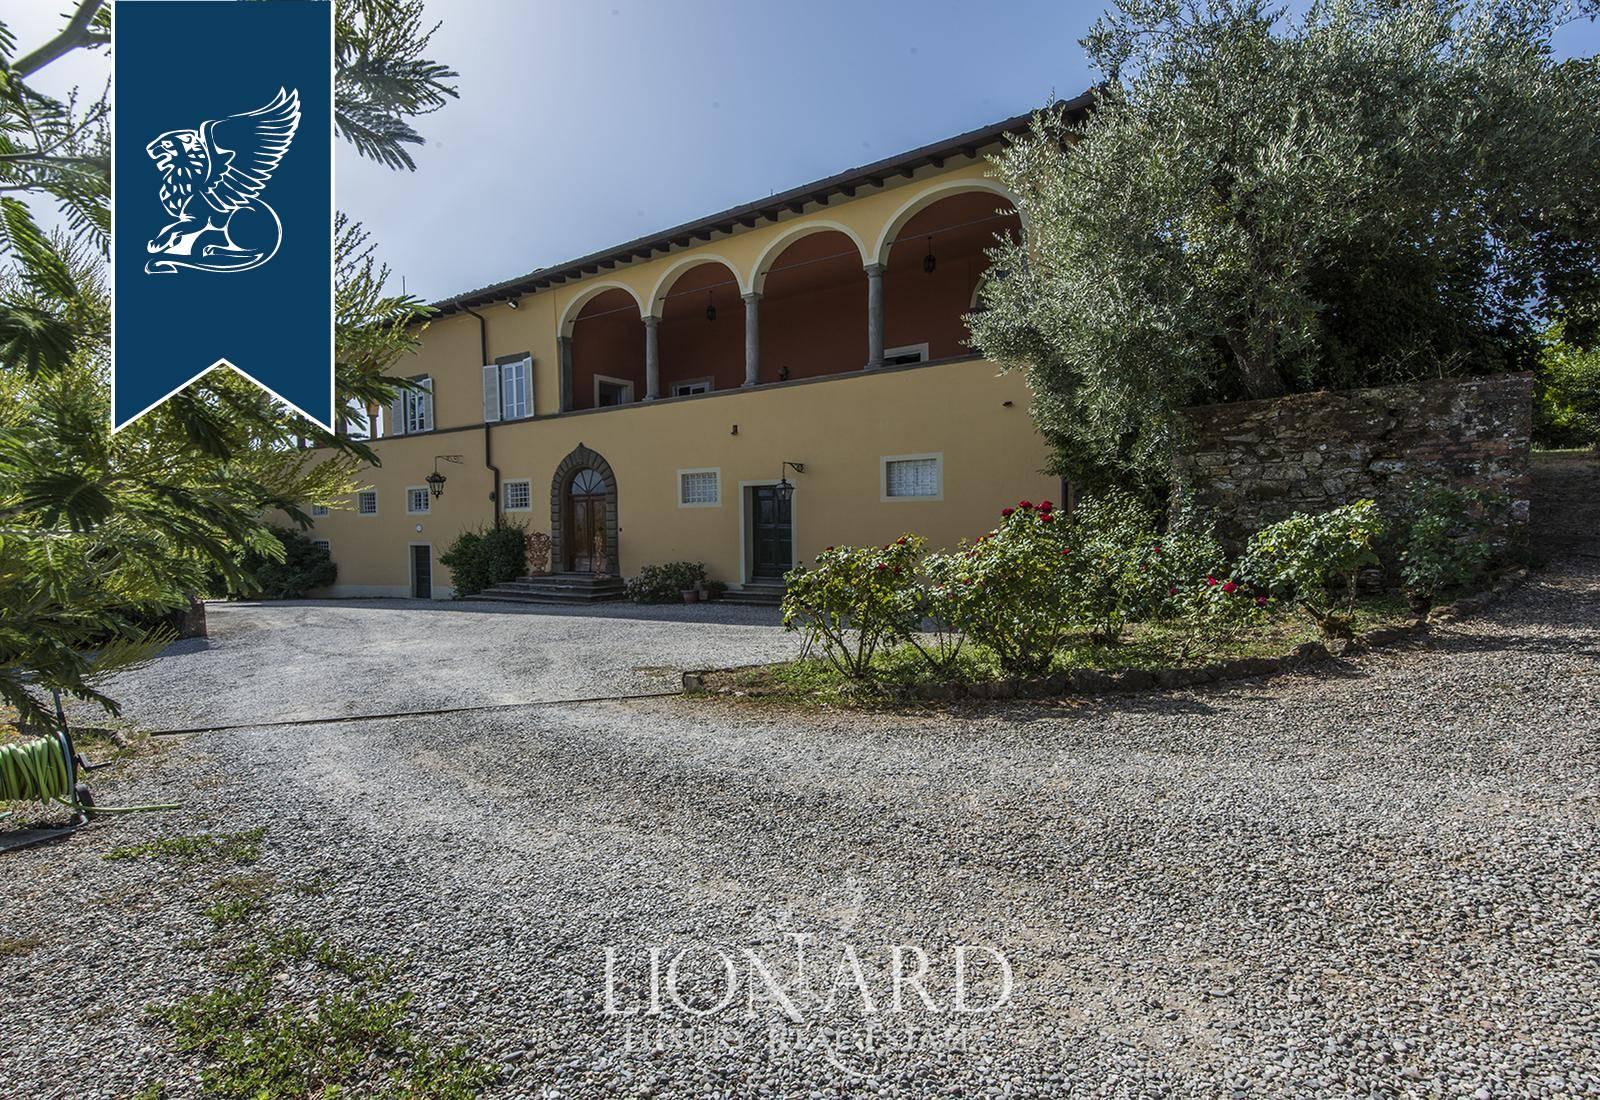 Villa in Vendita a Lucca: 0 locali, 1400 mq - Foto 1